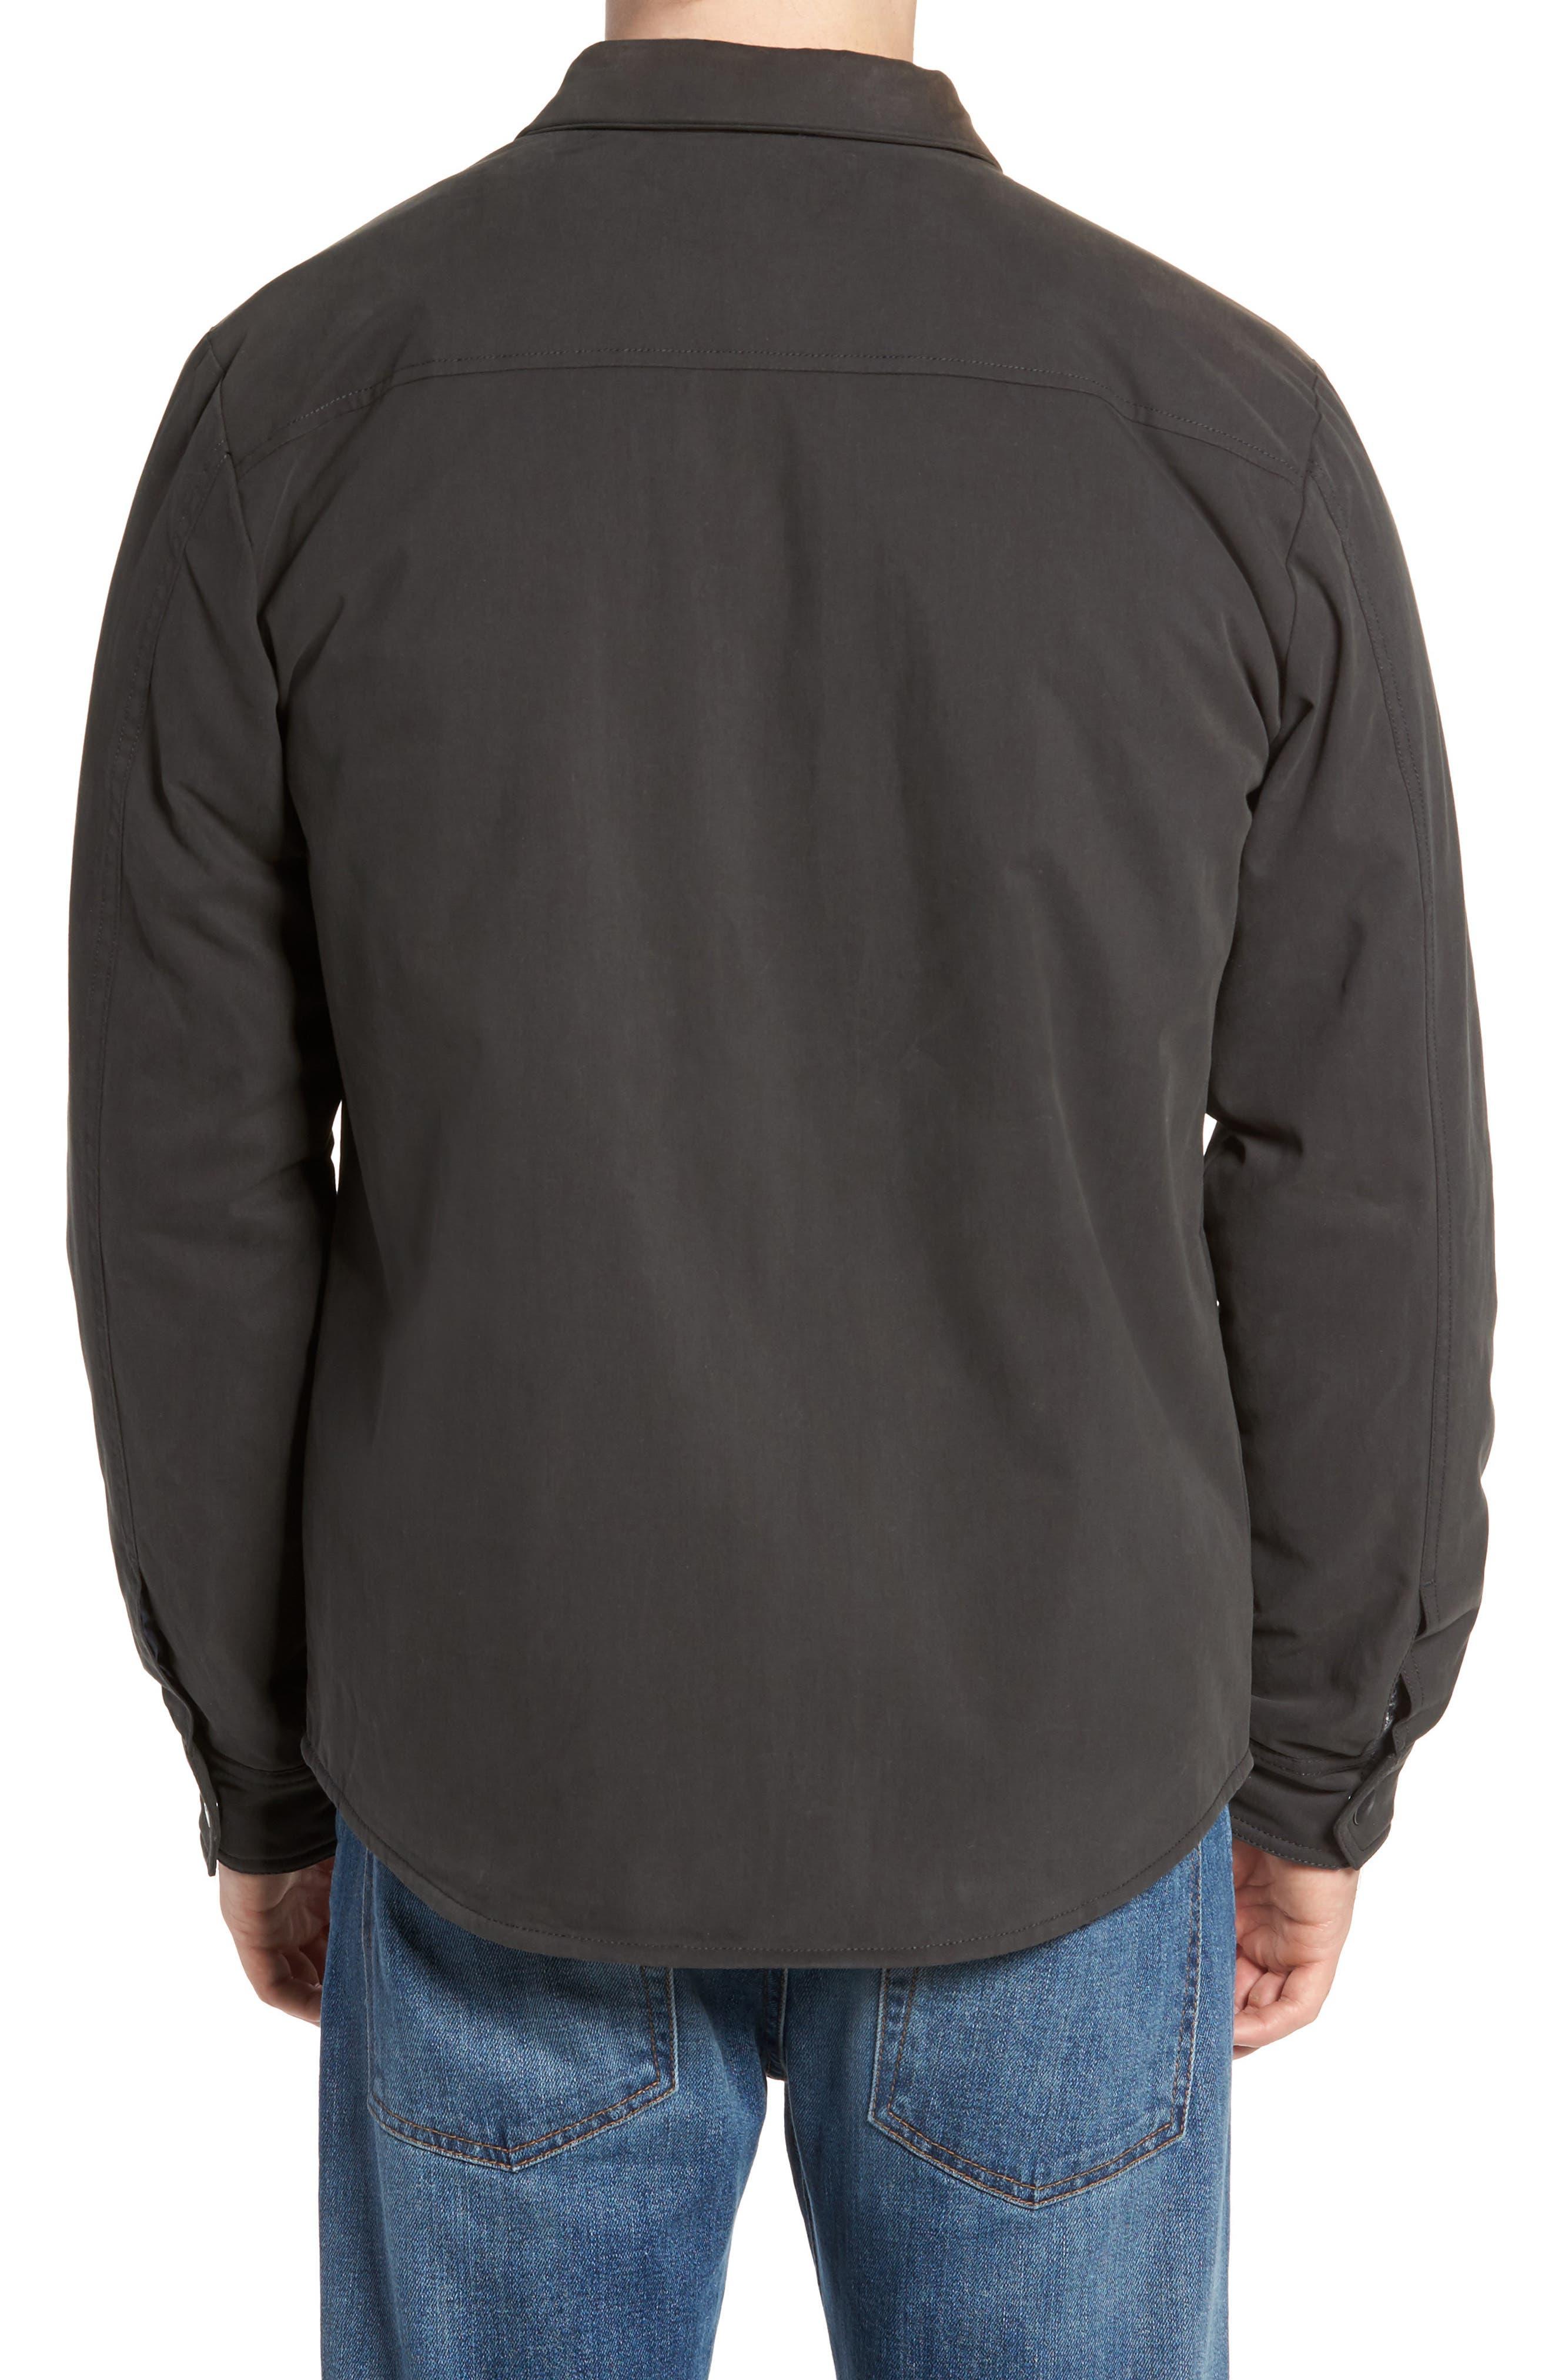 Officer's Shirt Jacket,                             Alternate thumbnail 2, color,                             Pirate Black